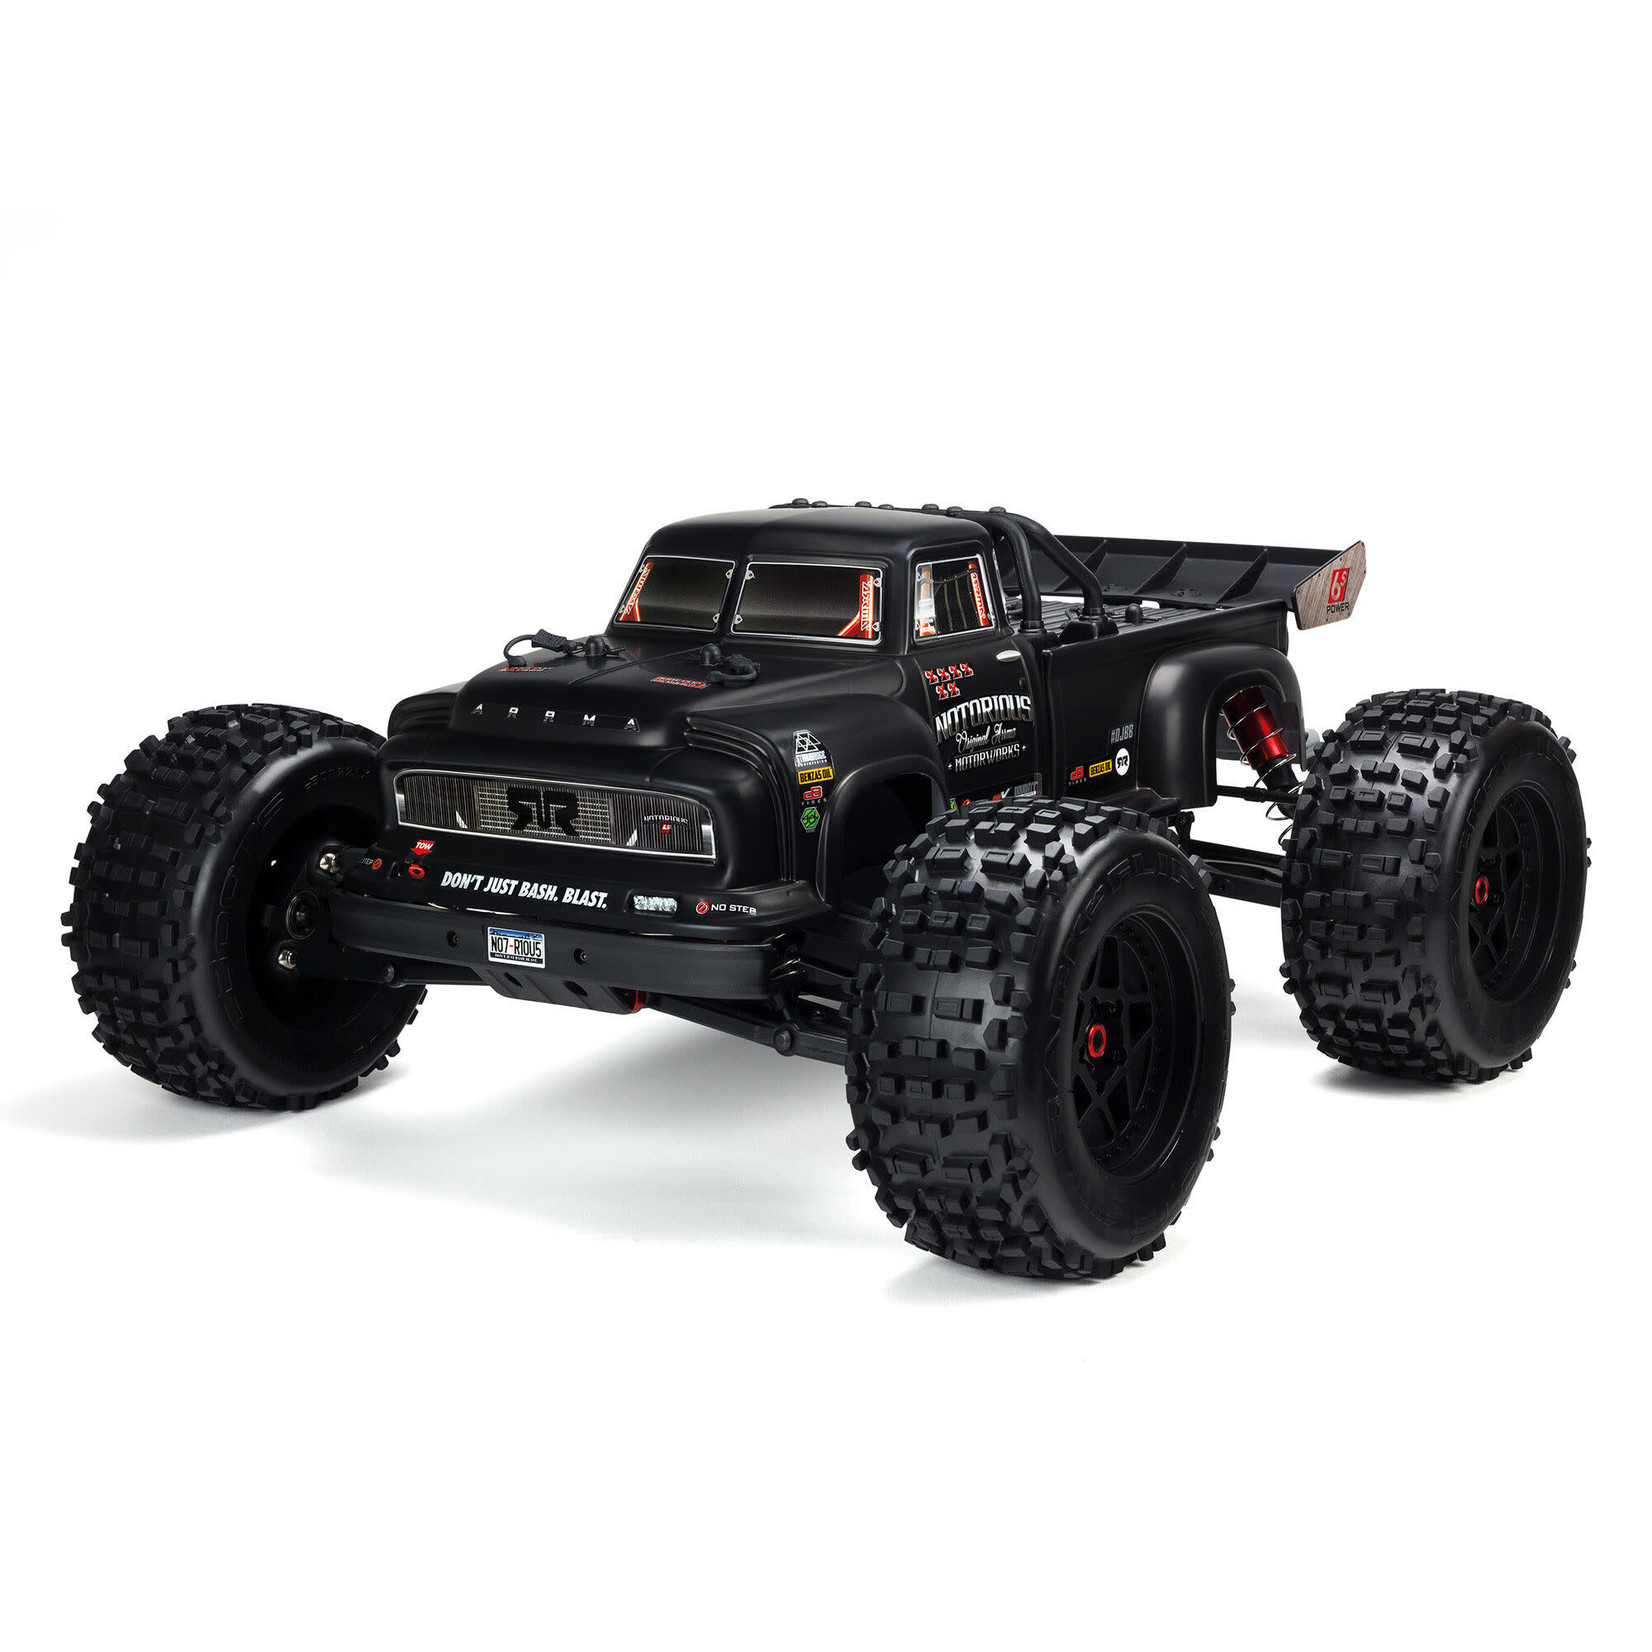 ARRMA ARA8611V5 Arrma 1/8 Notorious 6S 4WD Stunt Truck